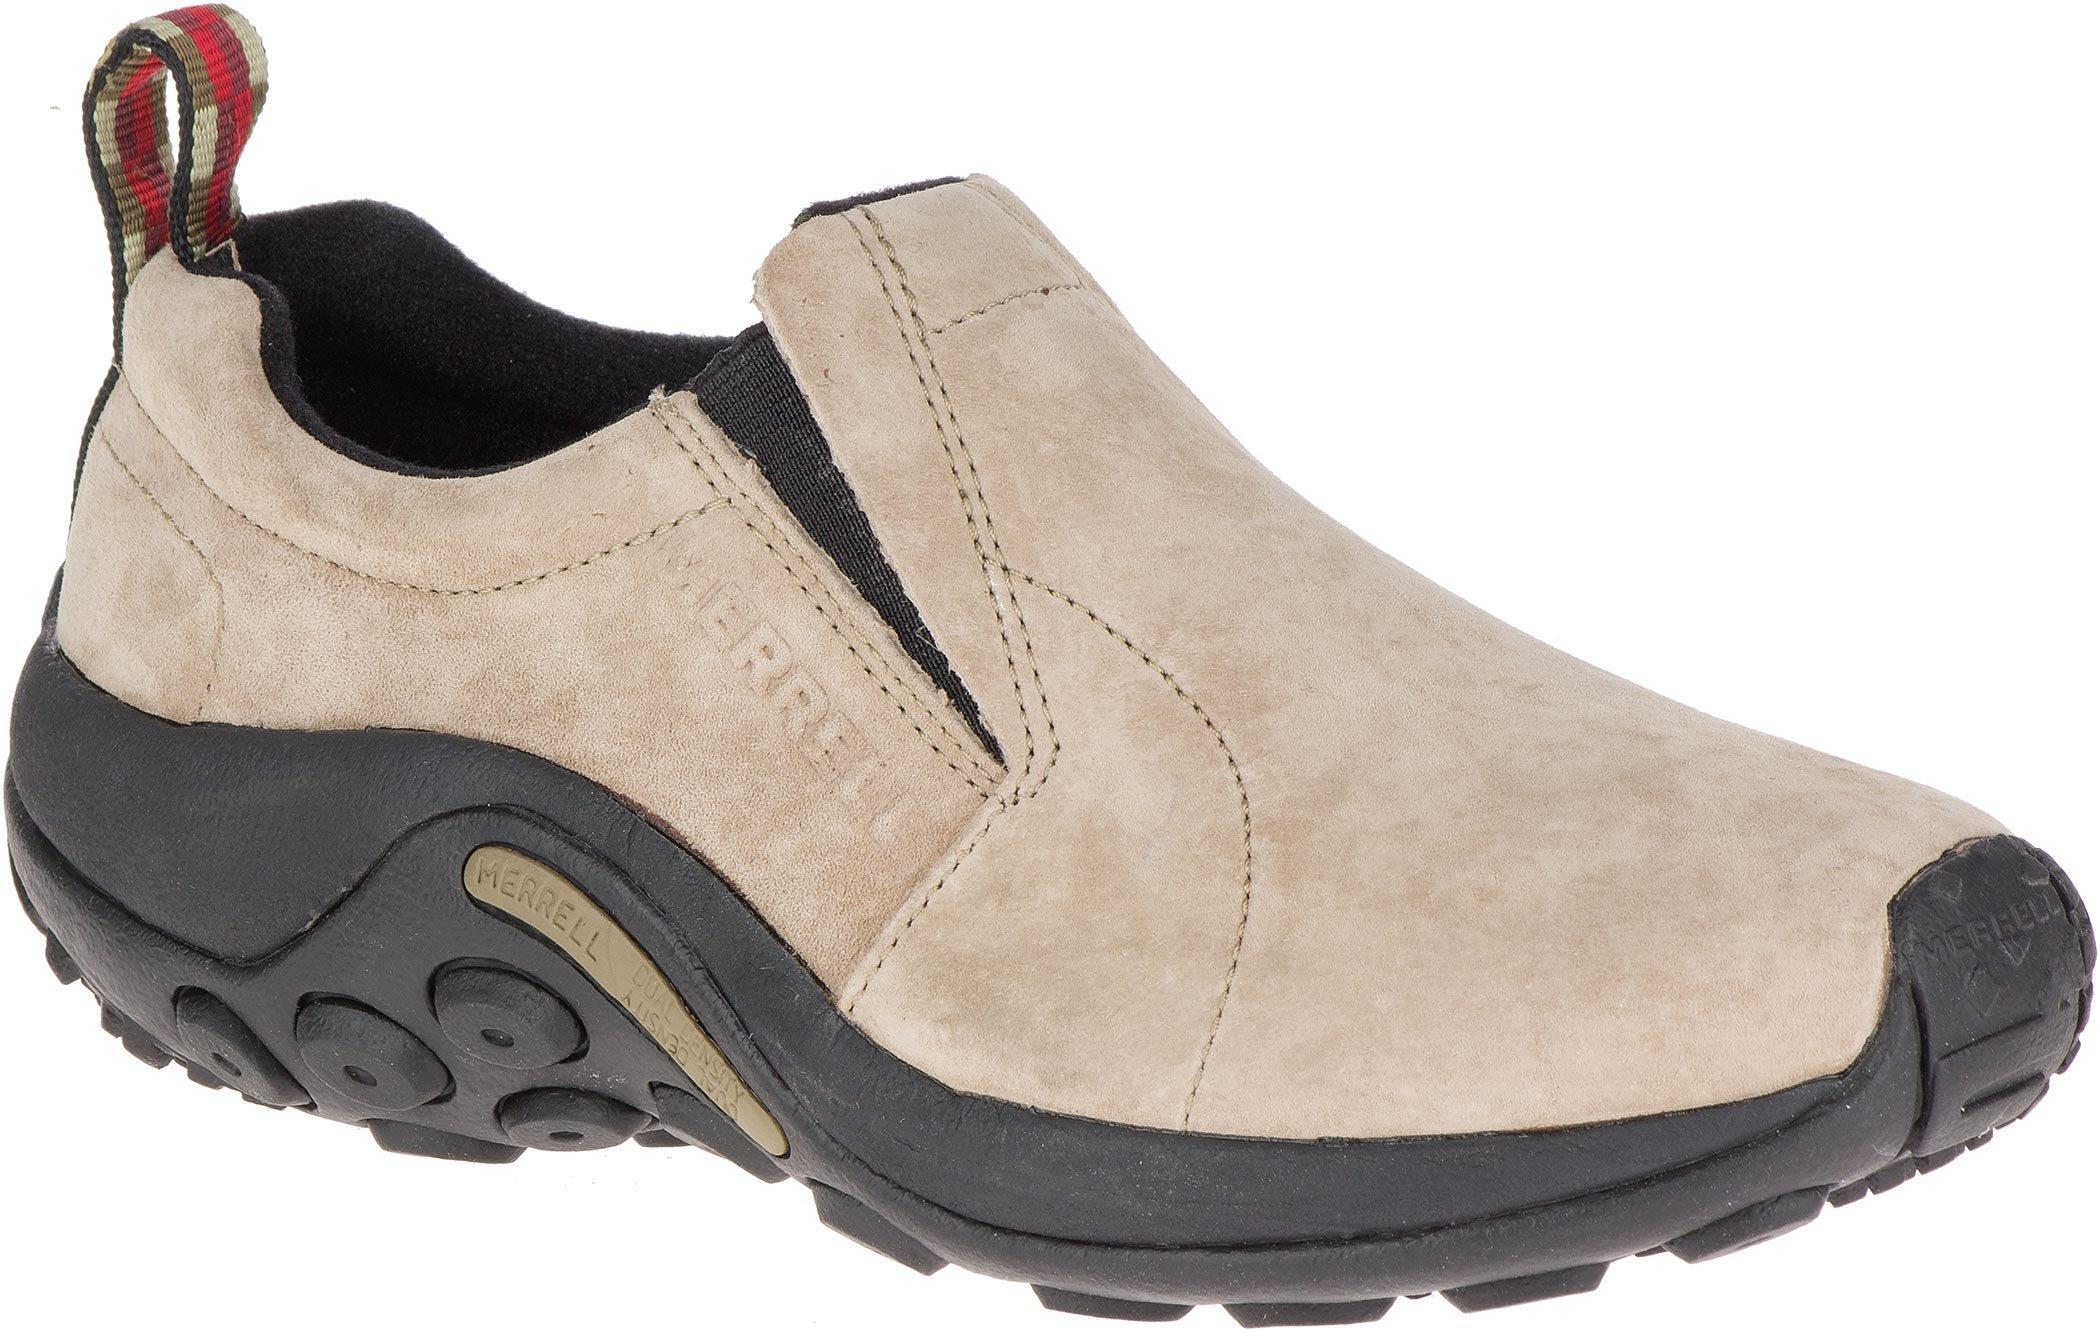 Damska vychazkova obuv monza 38  ea1fc3269d2